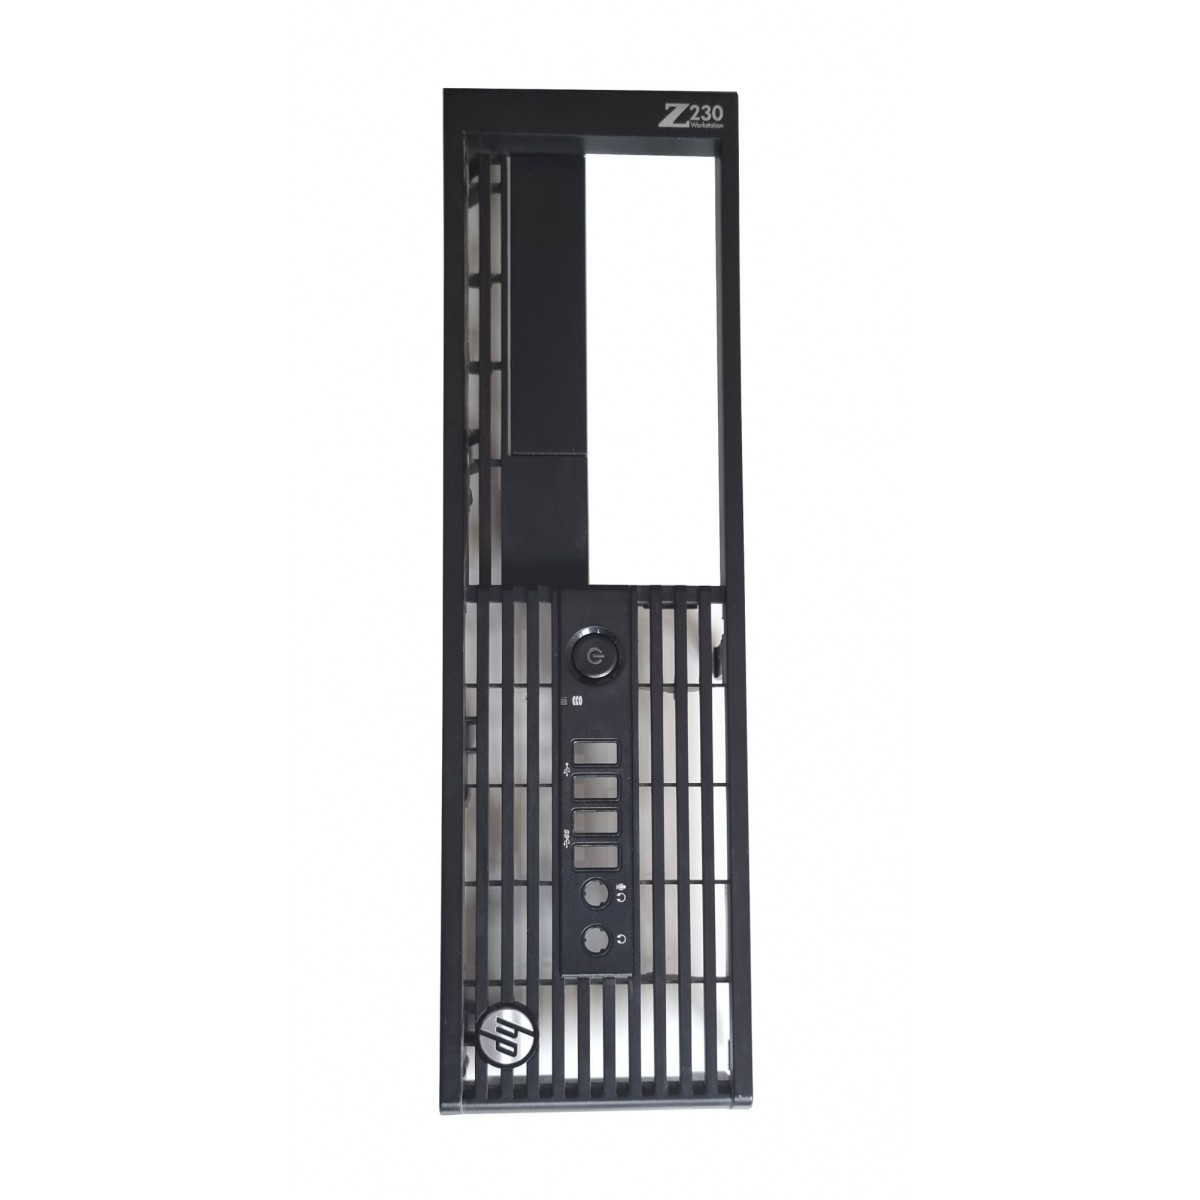 PAMIEC SAMSUNG 4GB PC3L-12800E M391B5273DH0-YK0